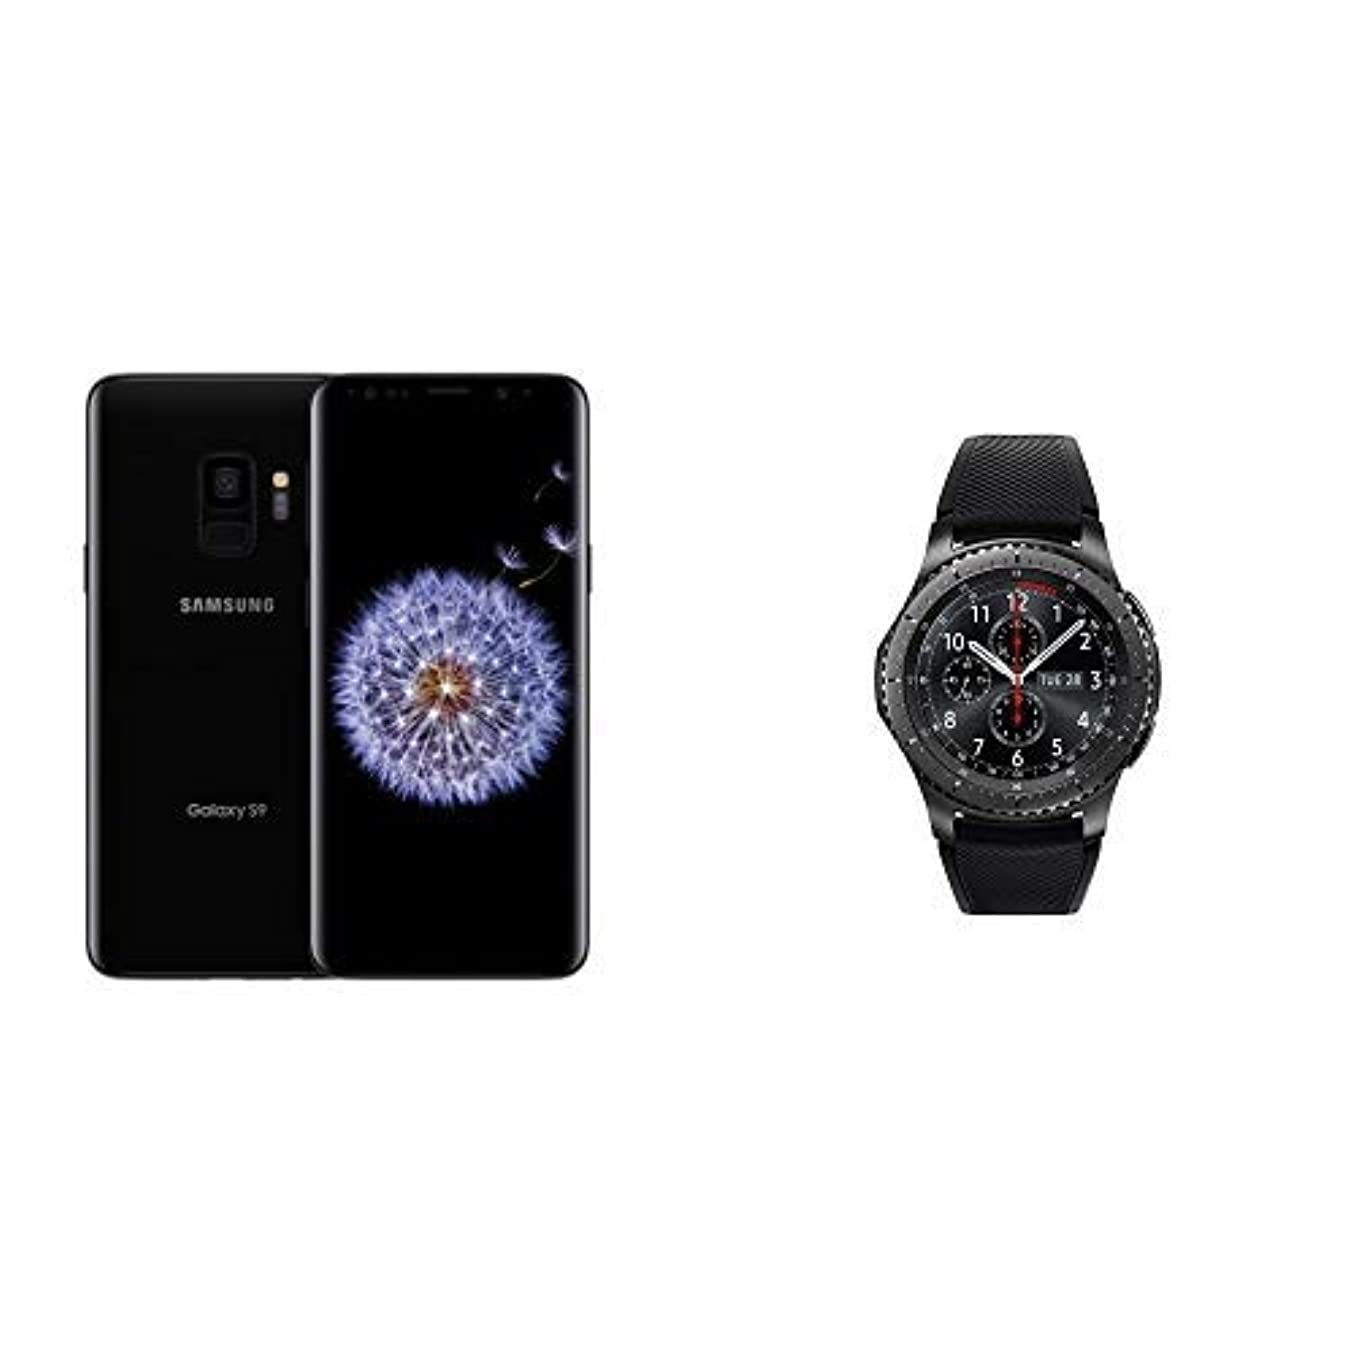 Samsung Galaxy S9 Unlocked Smartphone - 64GB - Midnight Black - US Warranty with Gear S3 Frontier Smartwatch